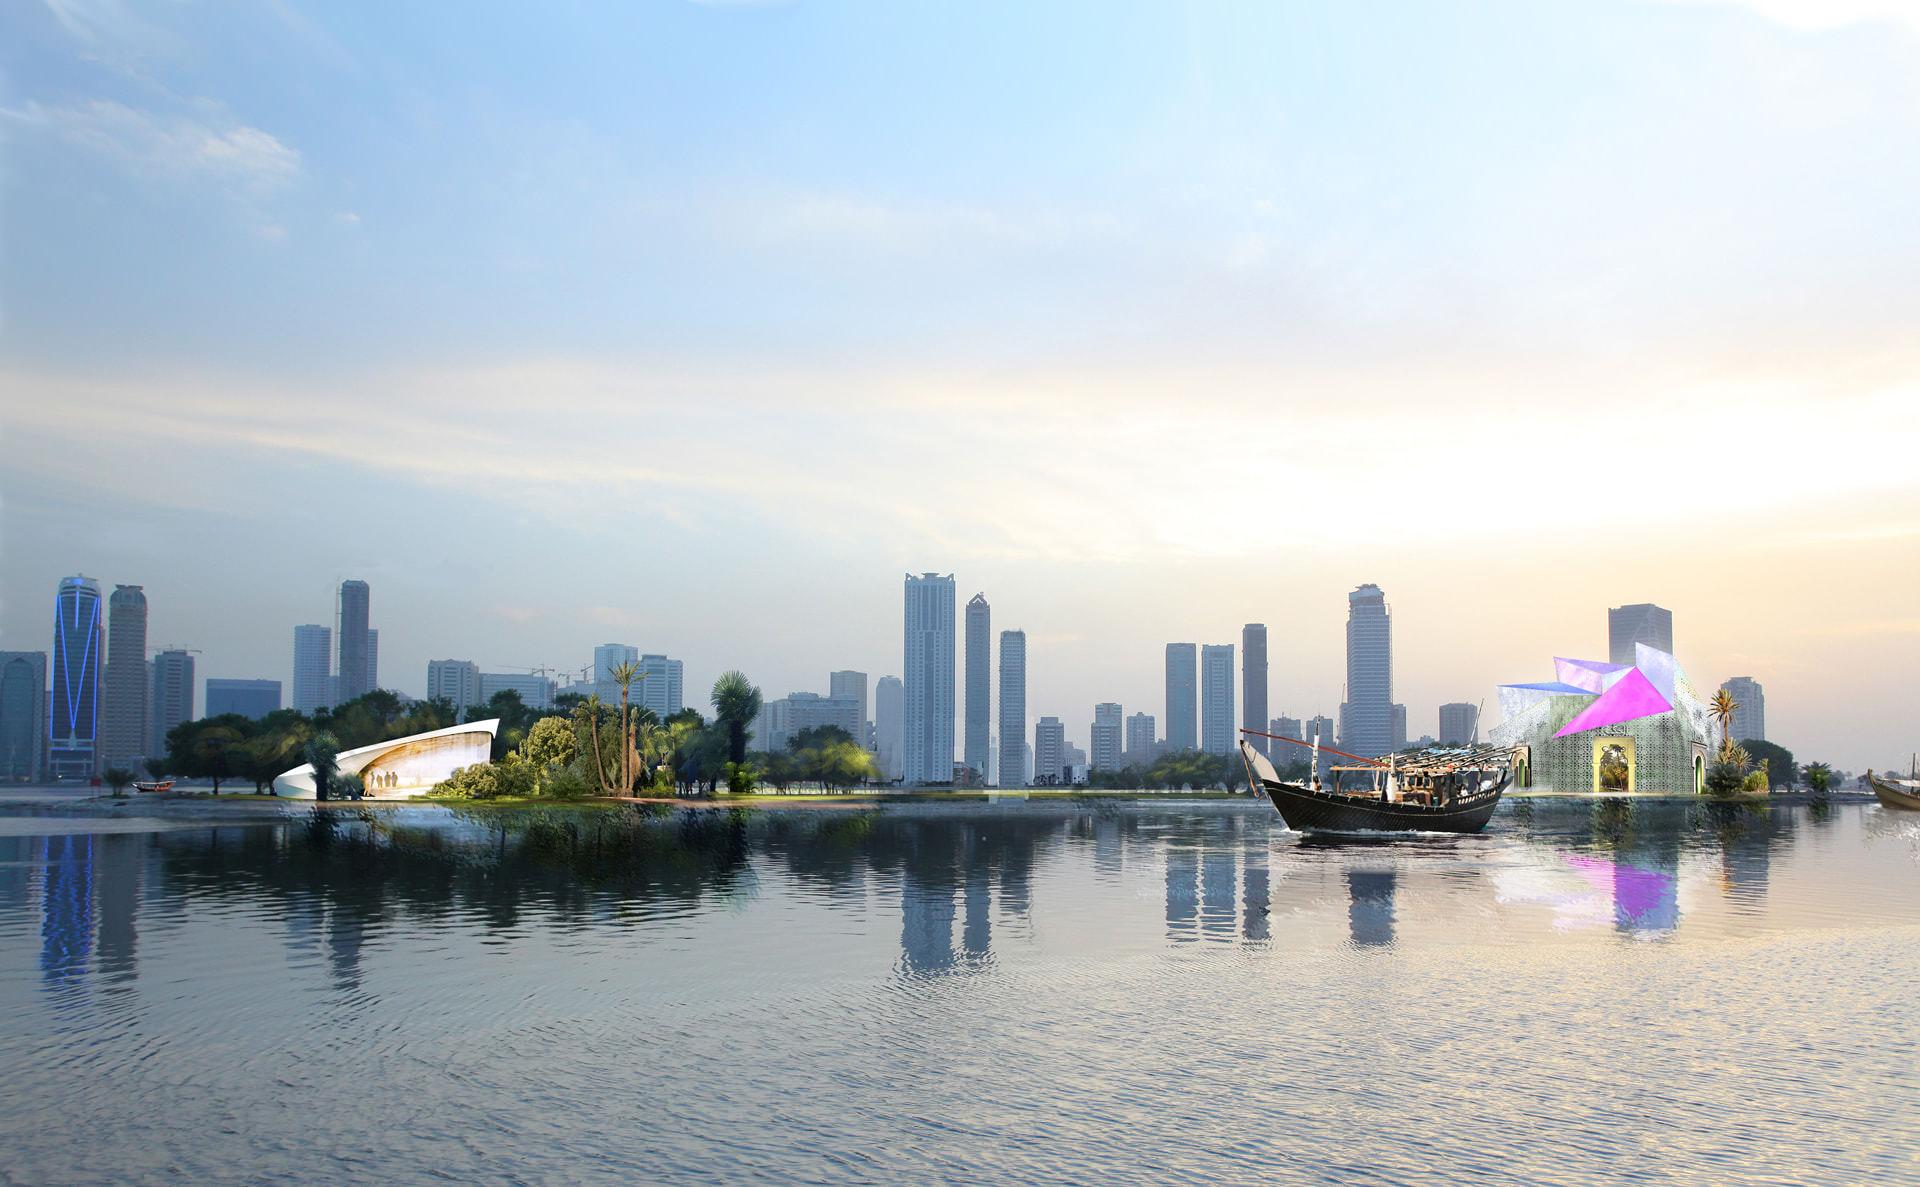 Noor island visual development concept.